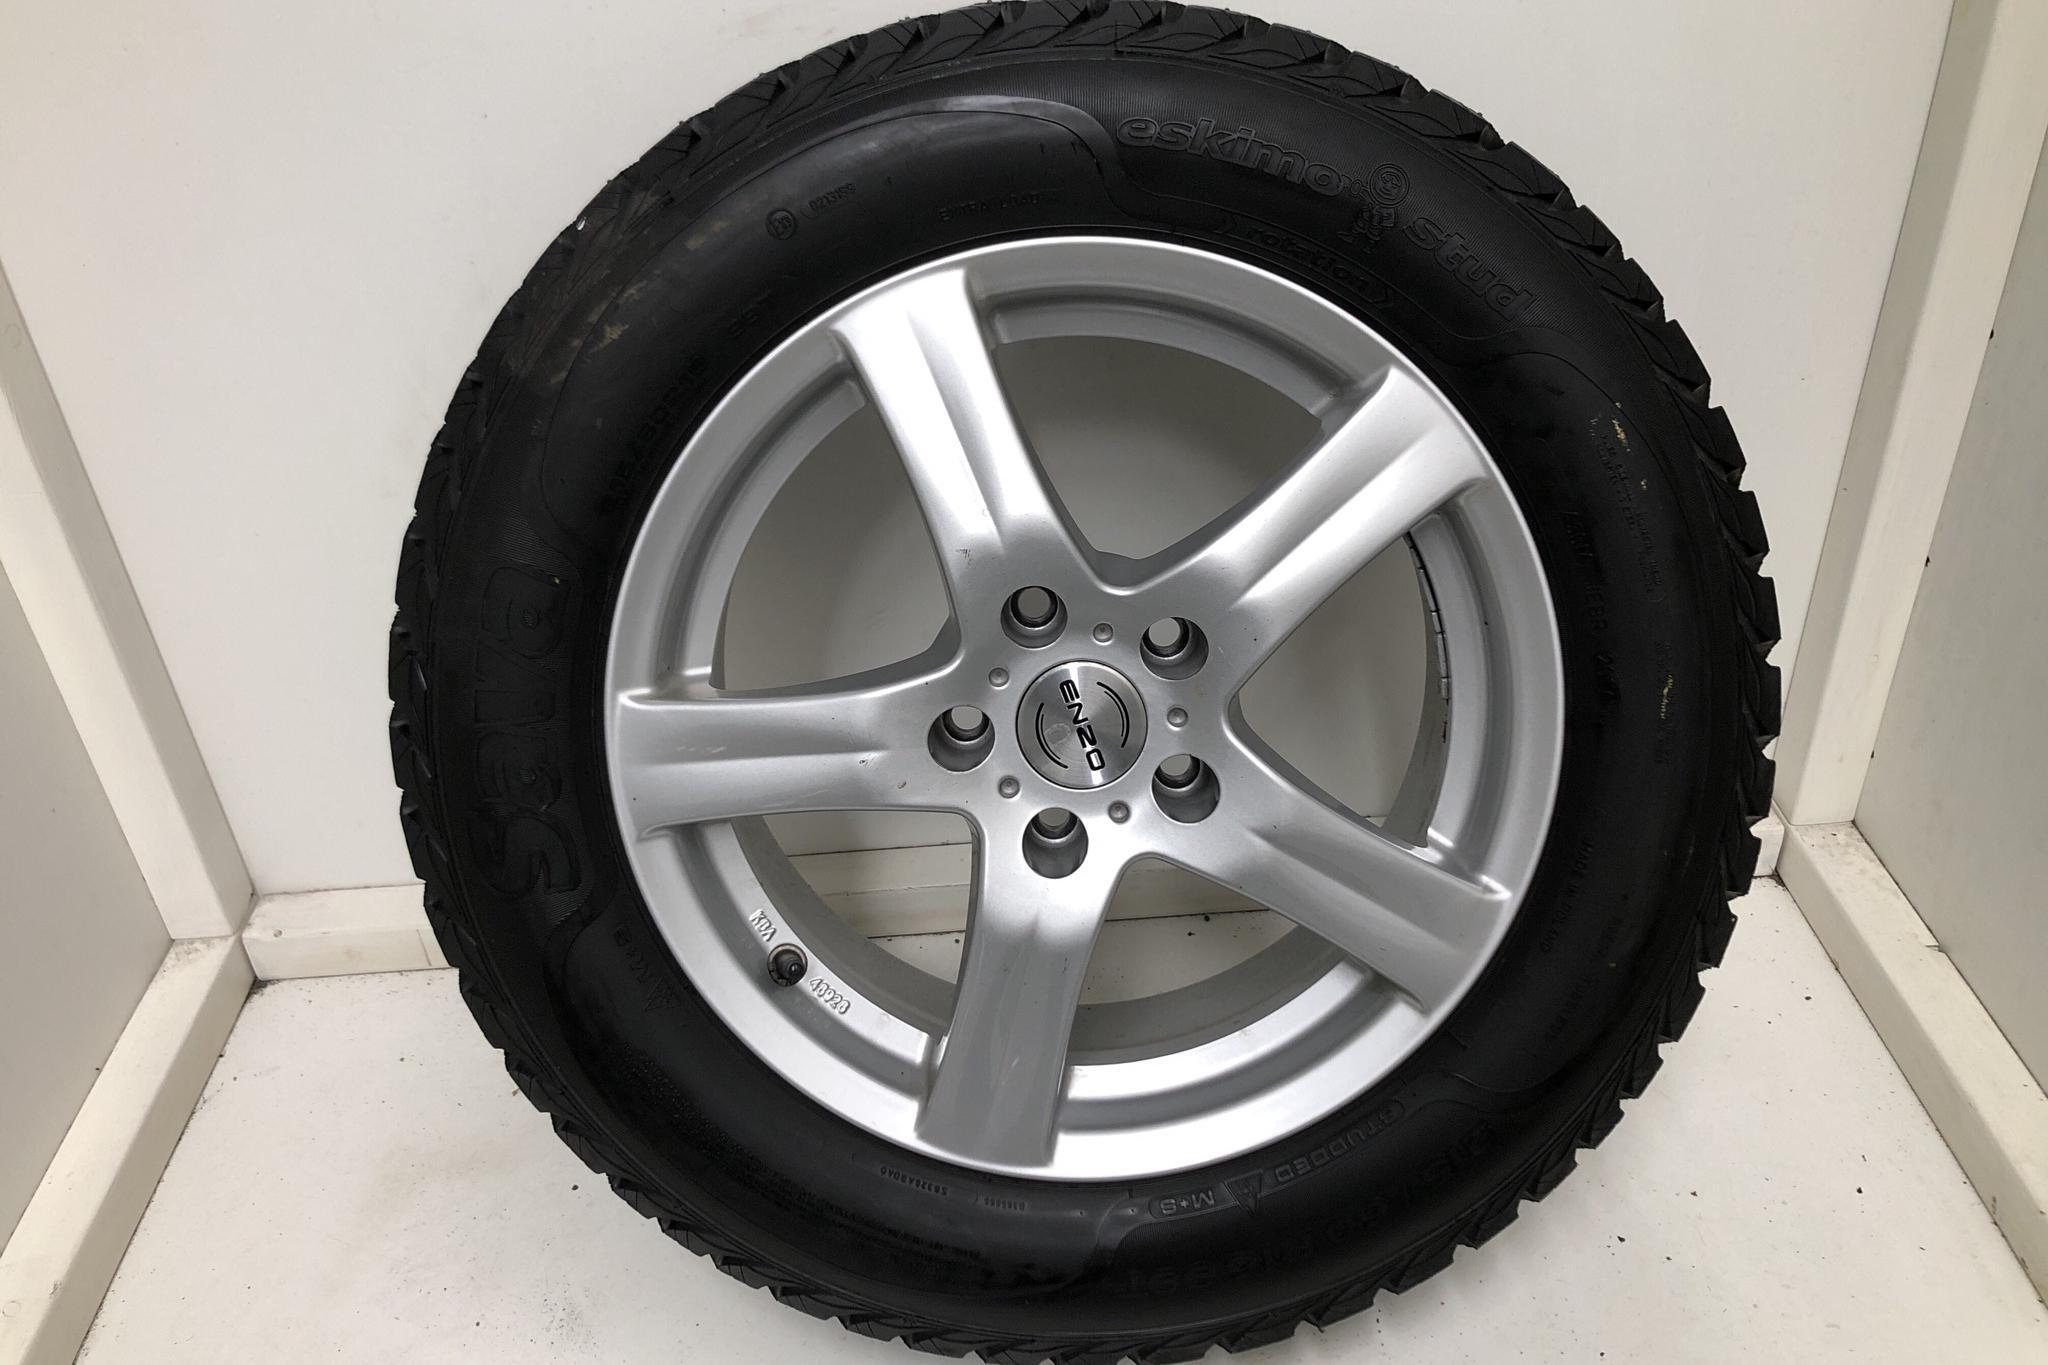 VW Passat 2.0 TDI Sportscombi (190hk) - 70 060 km - Automatic - white - 2018